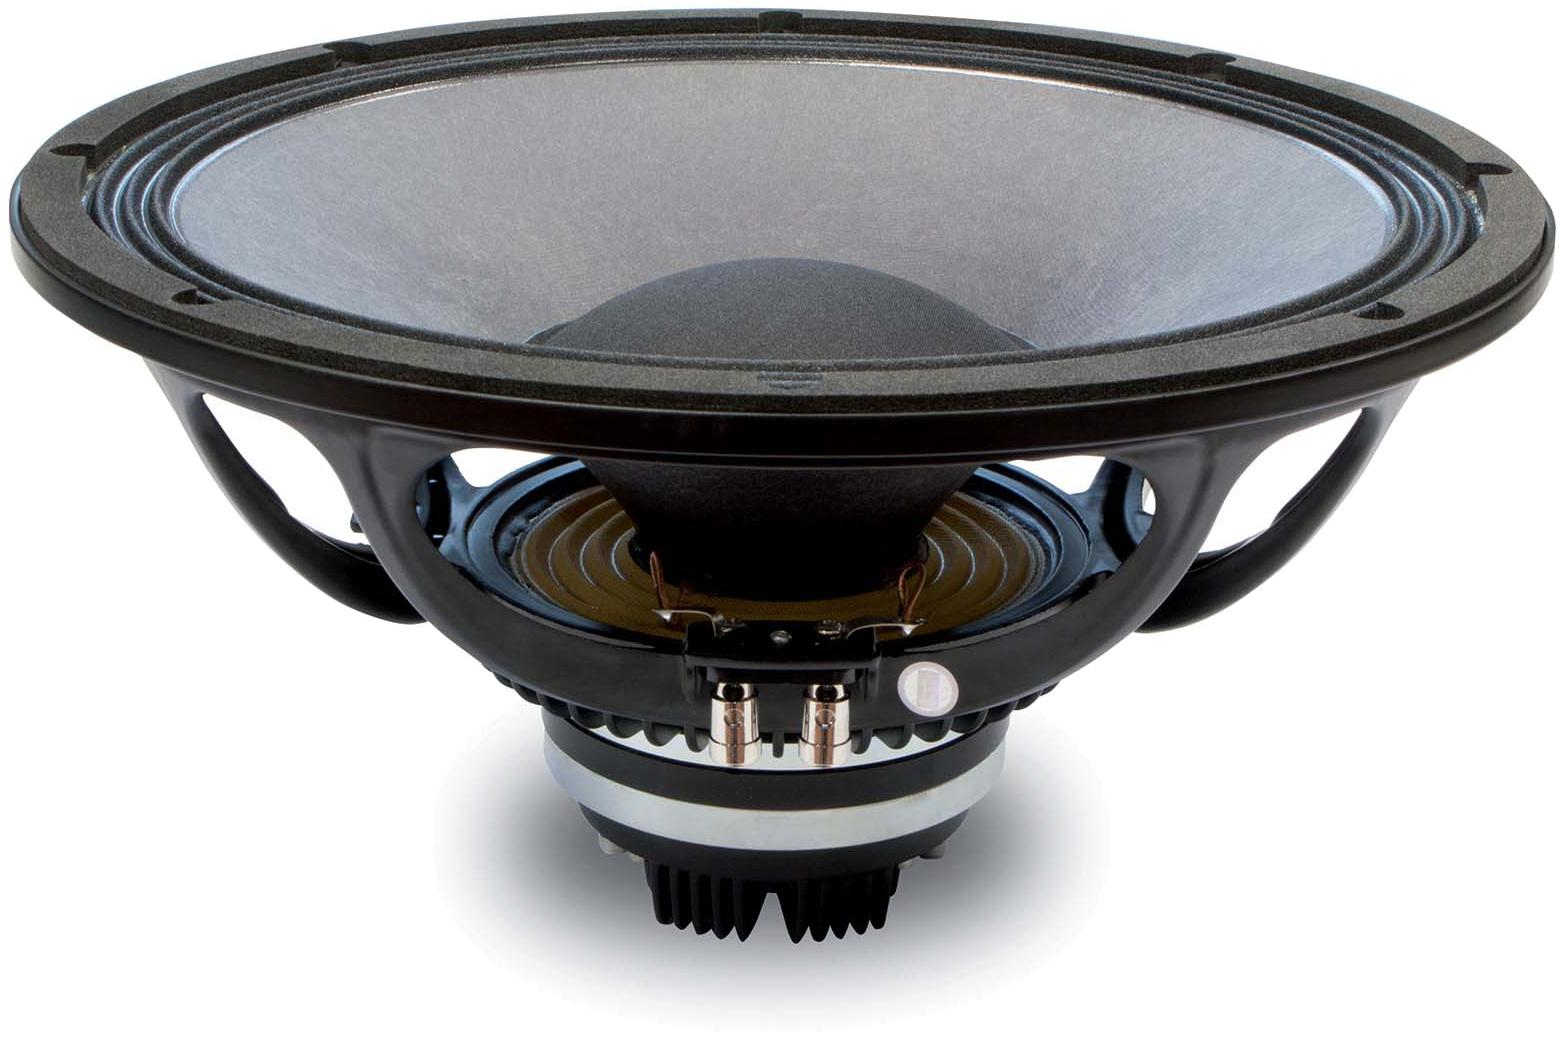 Eighteen Sound 15MB700 - 15